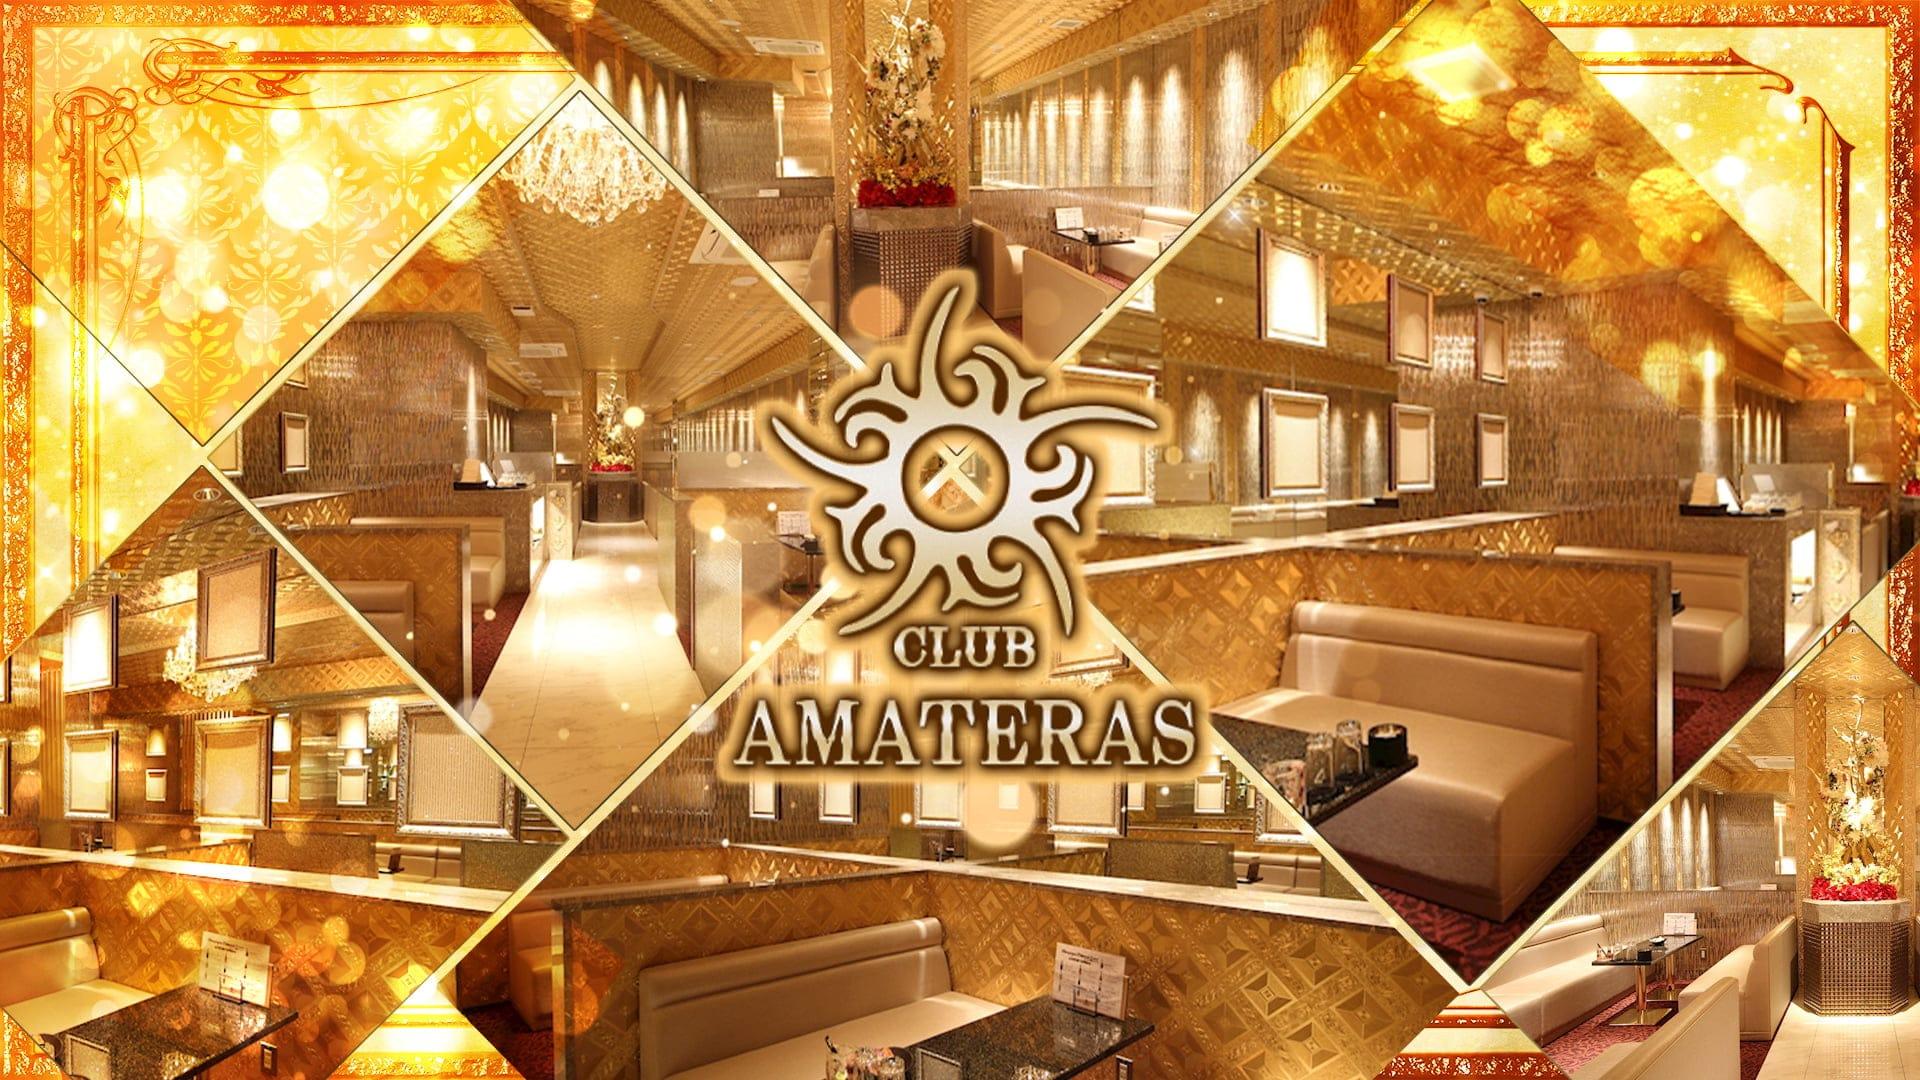 AMATERAS (アマテラス)【公式求人・体入情報】 祇園キャバクラ TOP画像